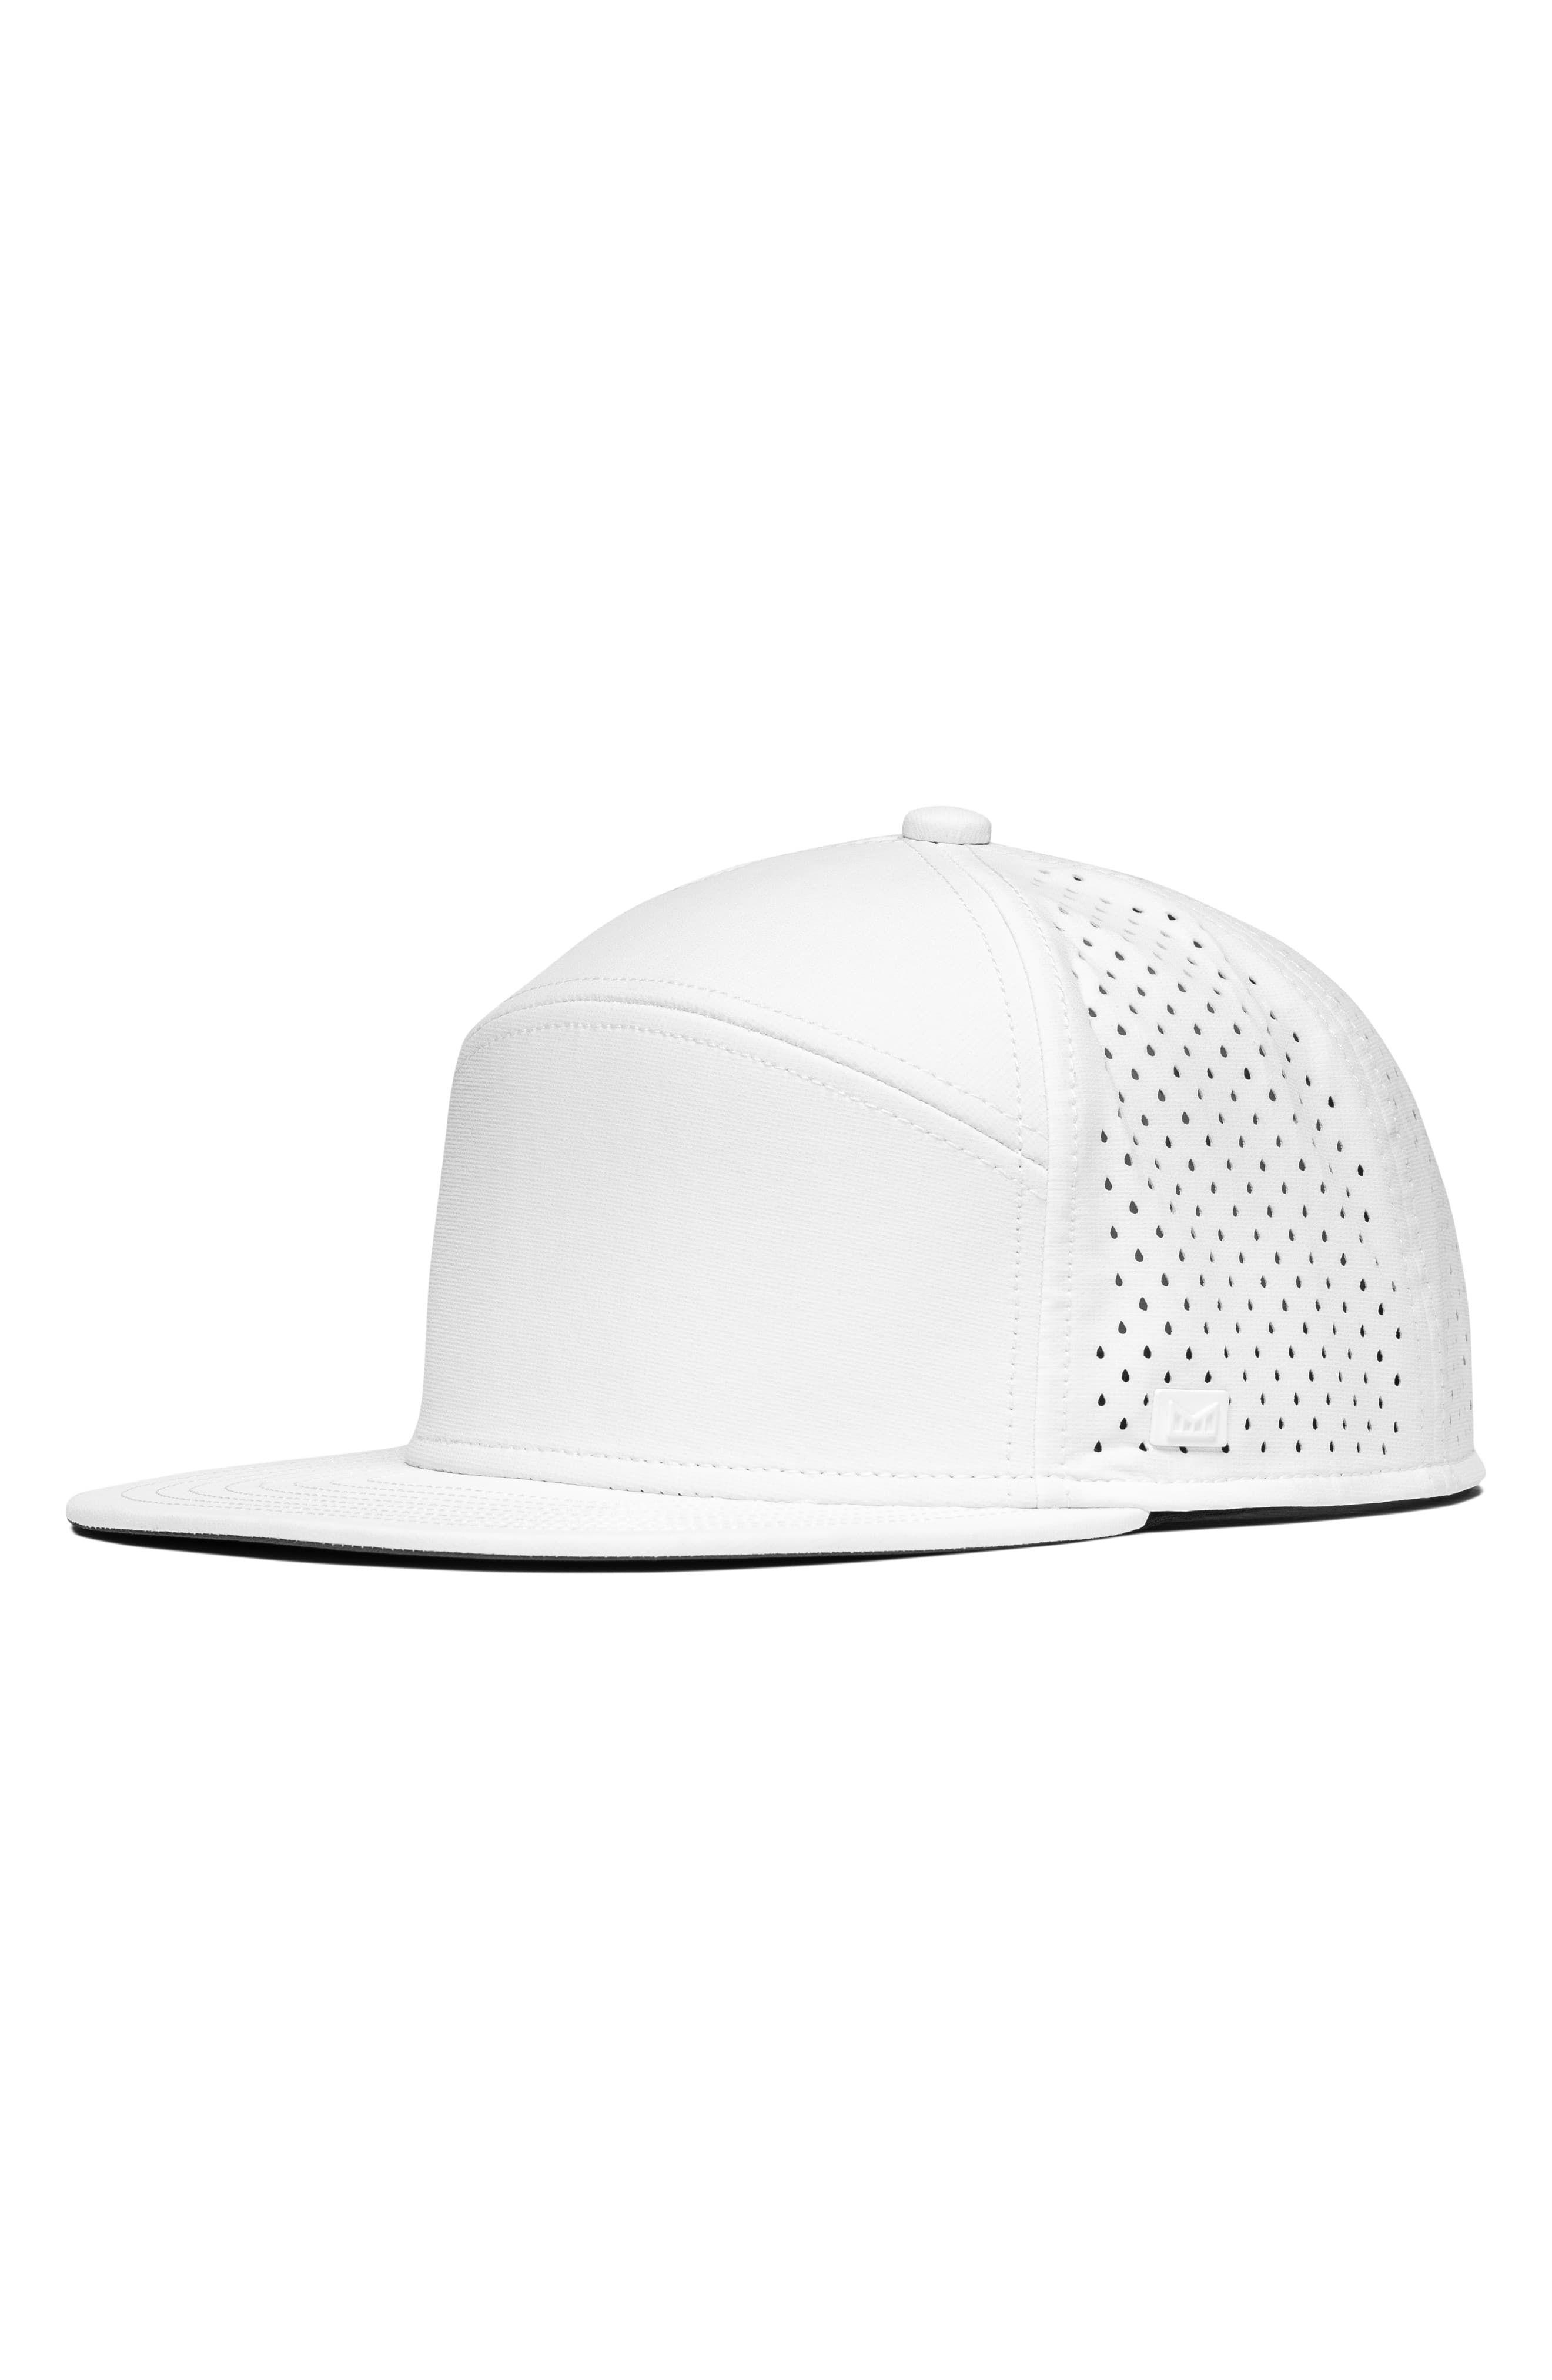 newest 529f0 281d9 Men s Melin Hydro Trenches Snapback Baseball Cap - White